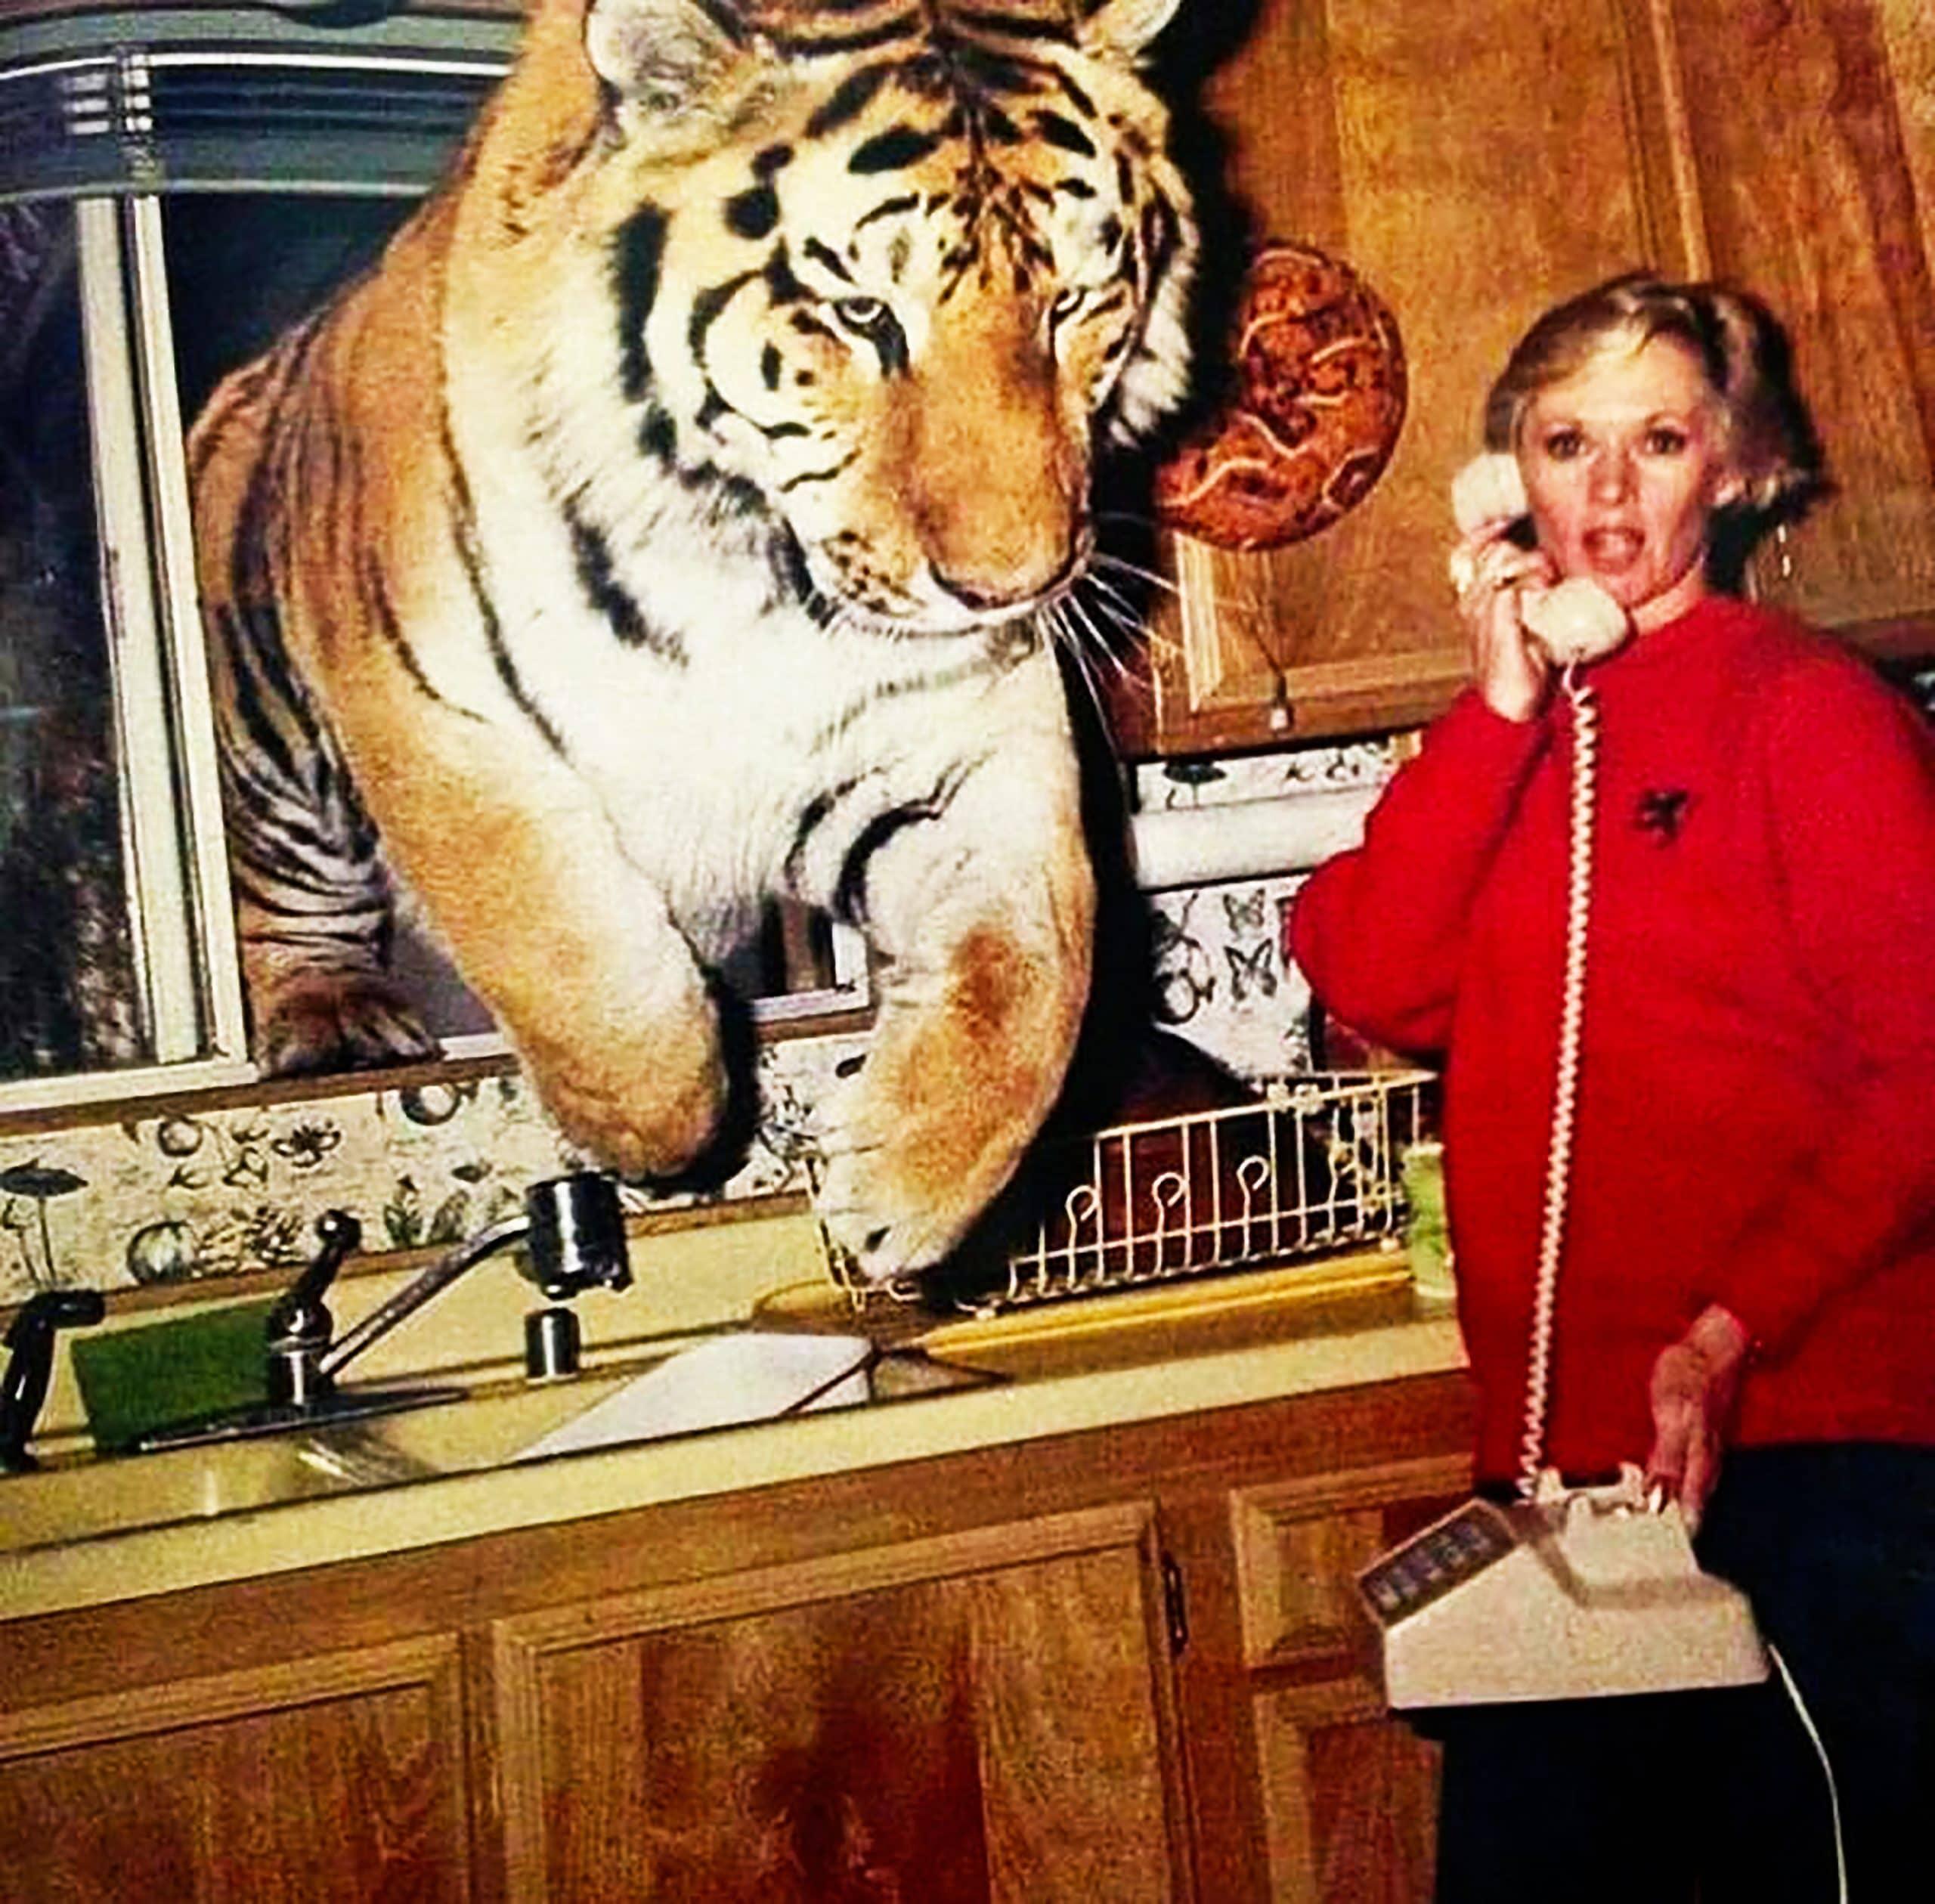 tippi hedren in her kitchen with a tiger